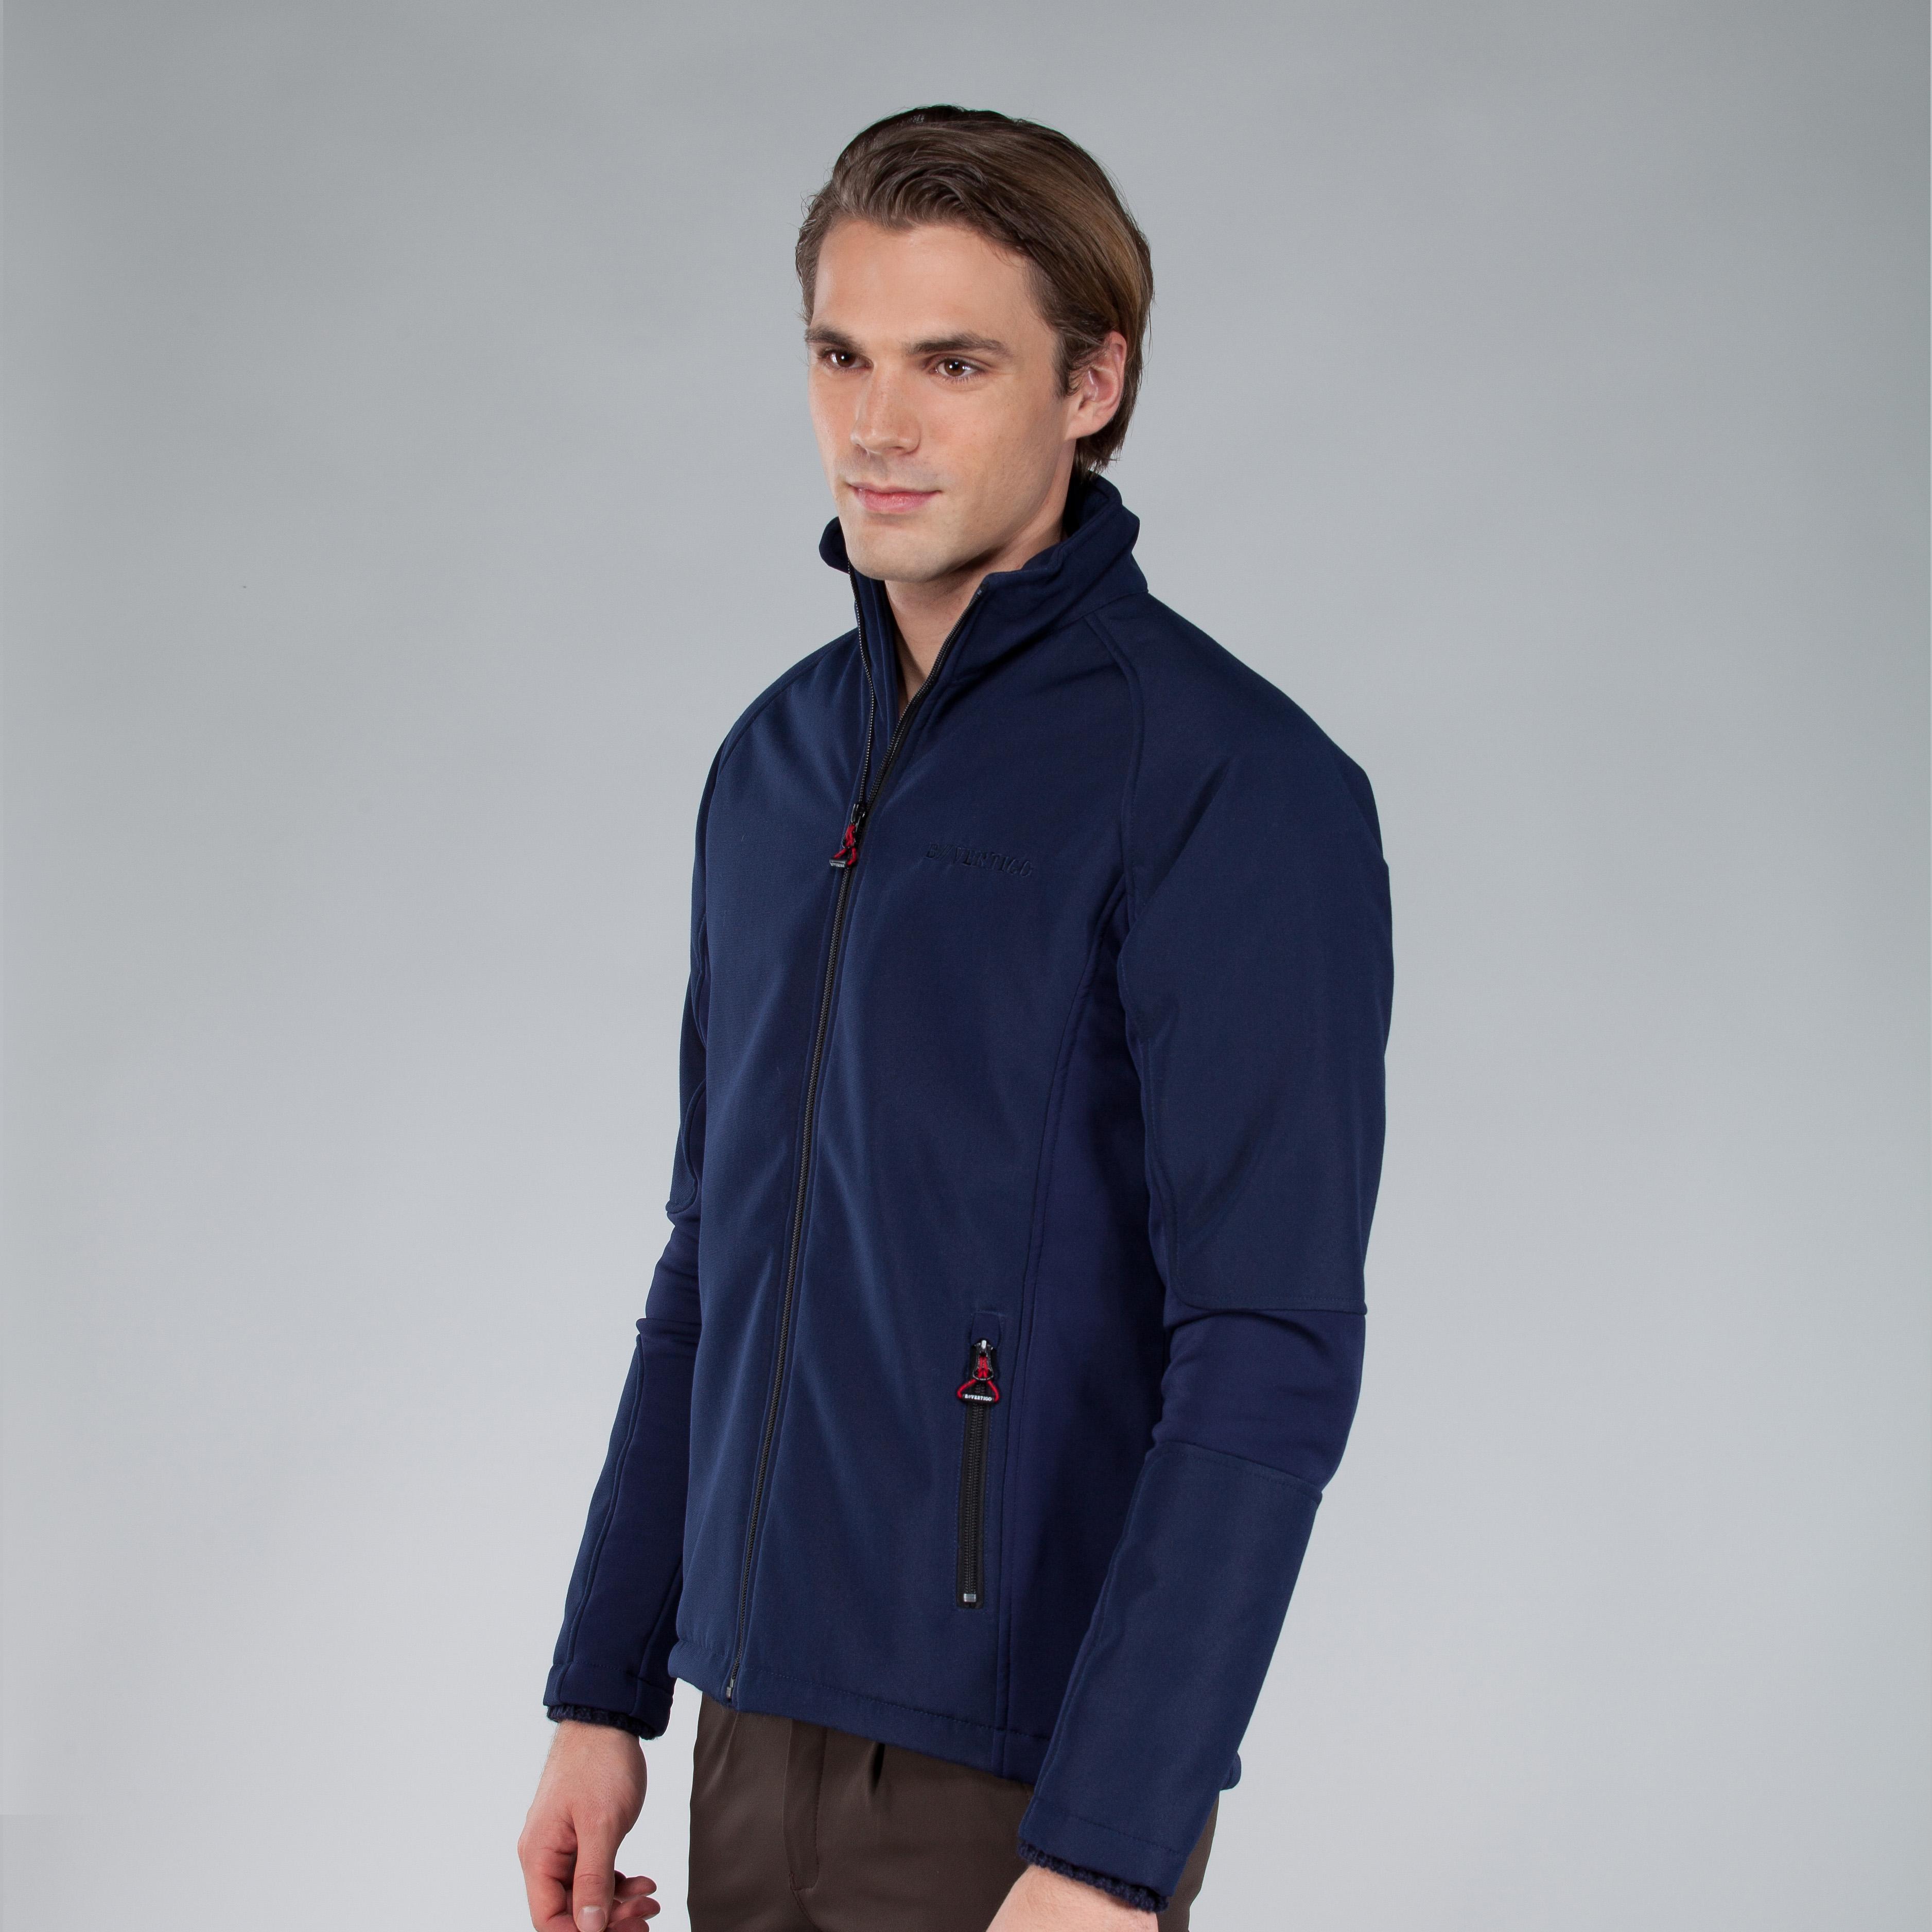 Horze Gordon Unisex Fleece Jacket